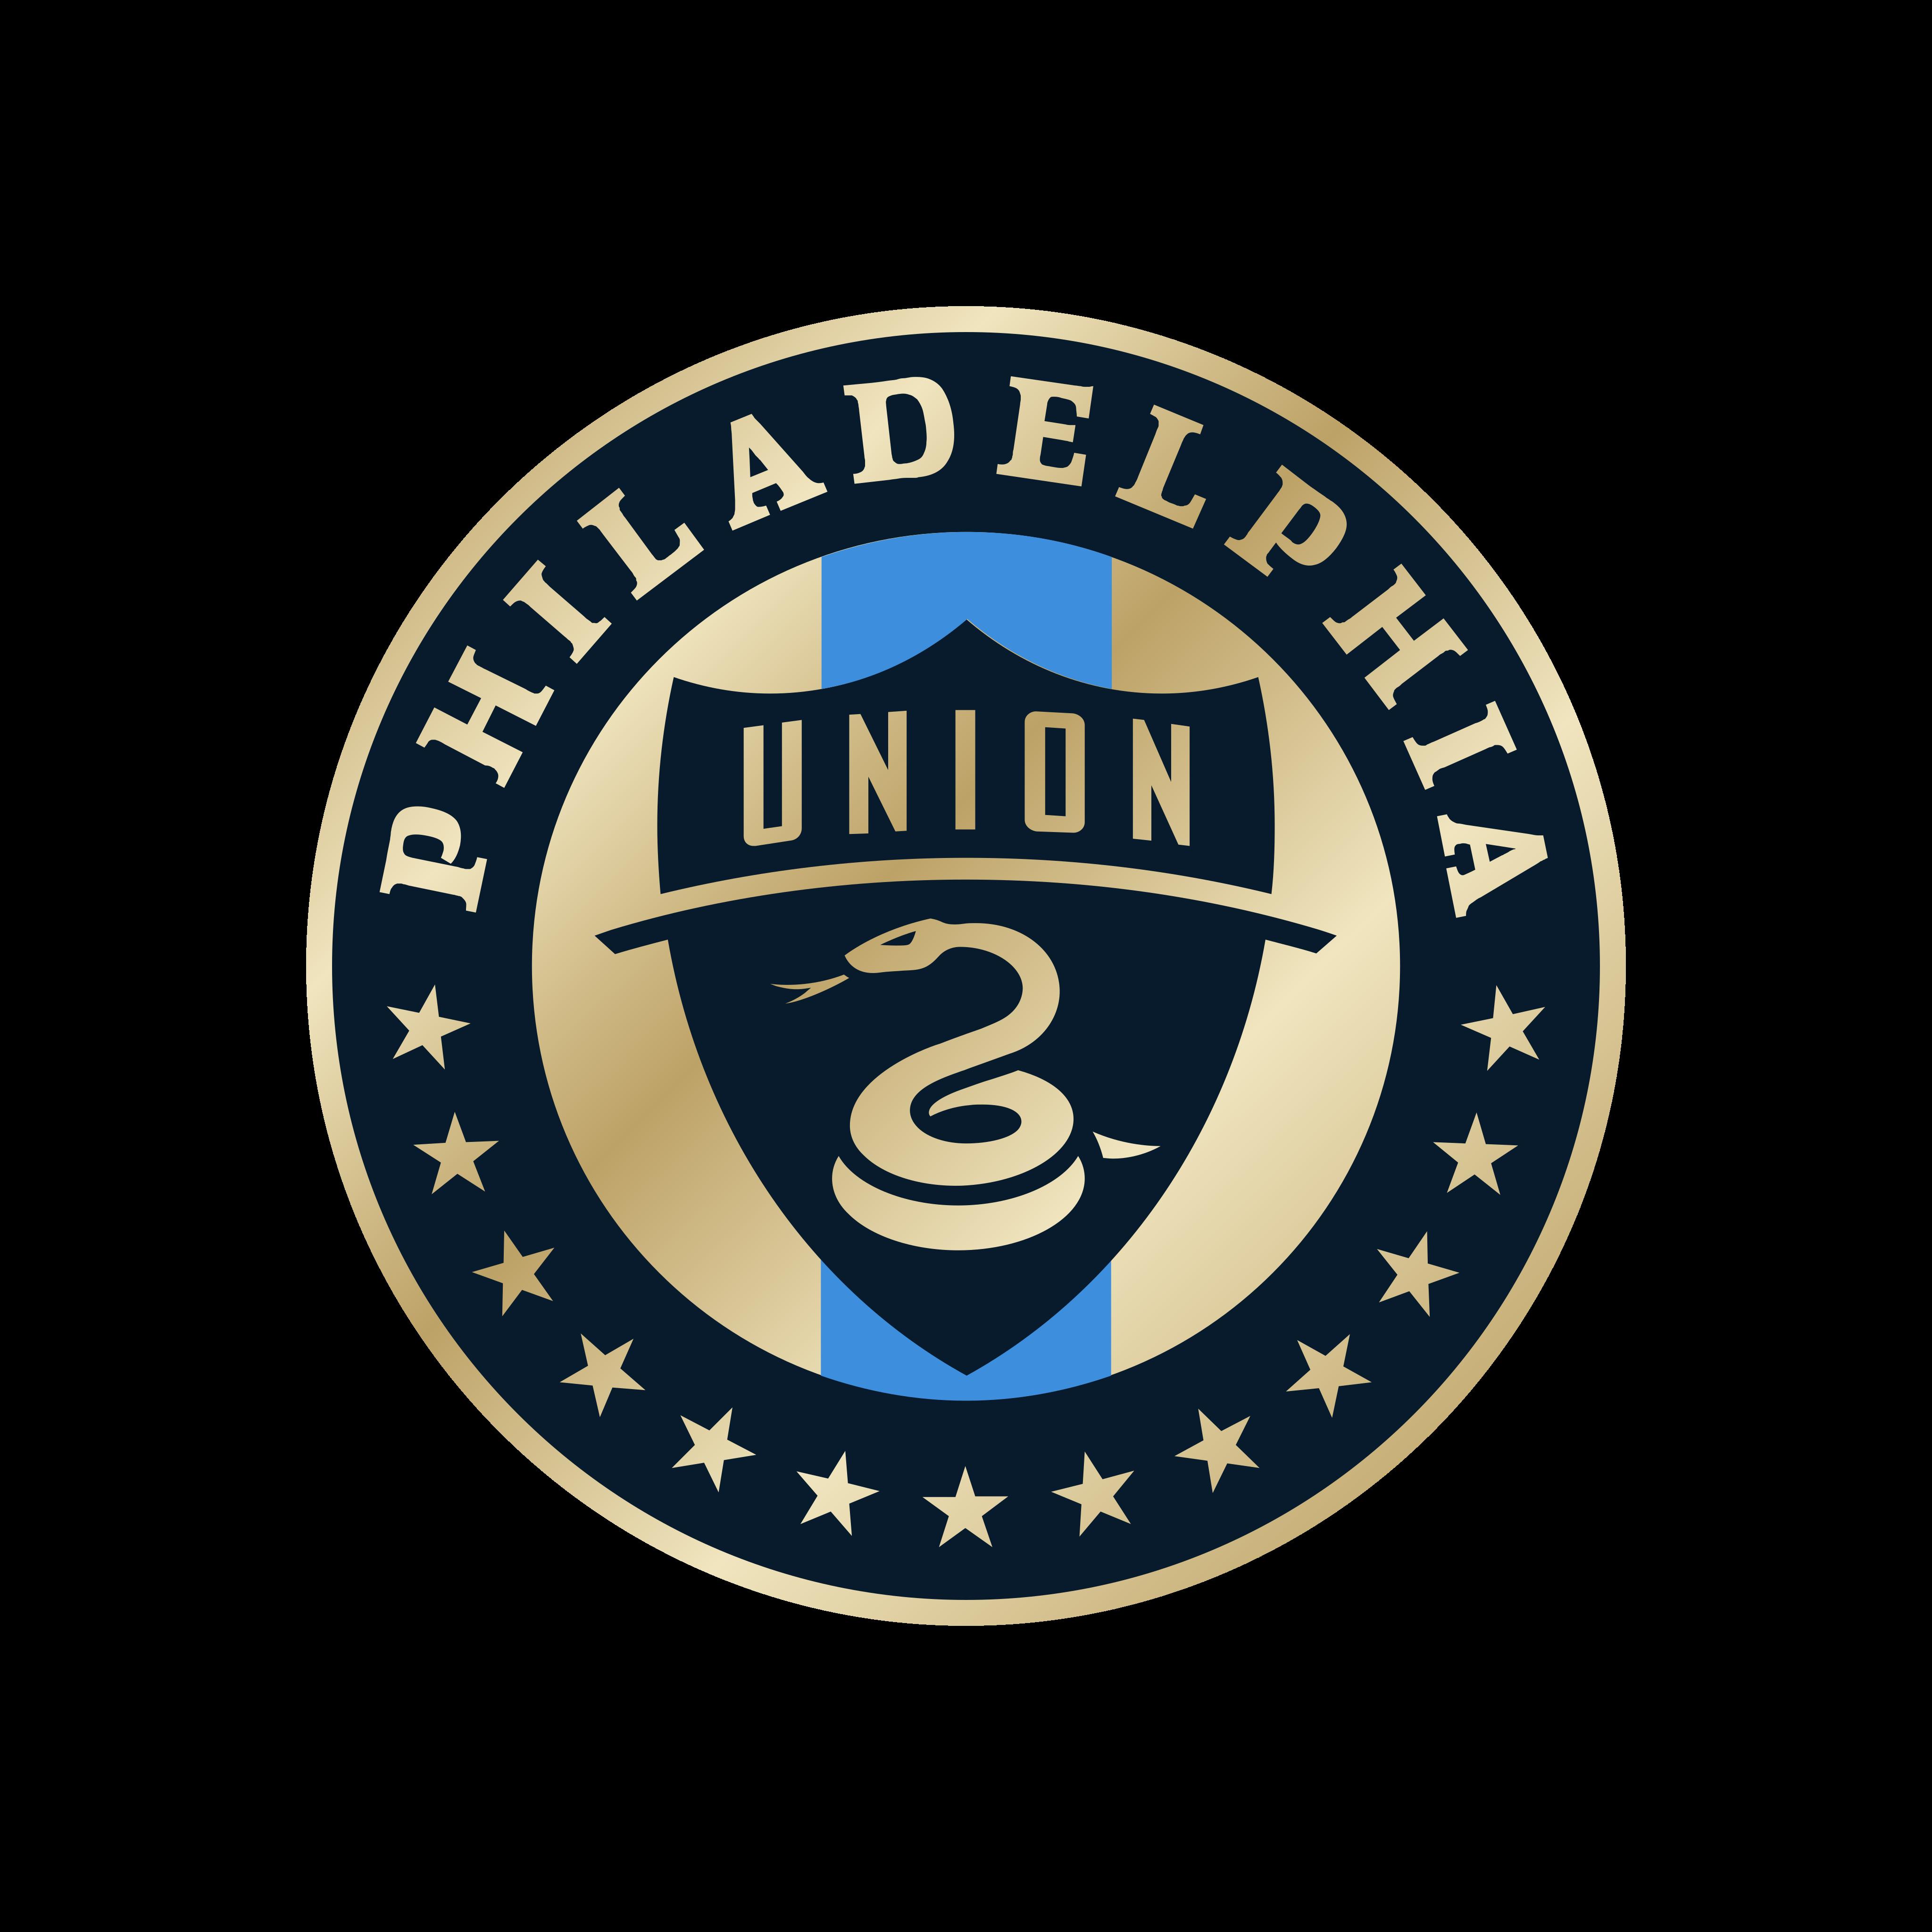 philadelphia union logo 0 - Philadelphia Union Logo